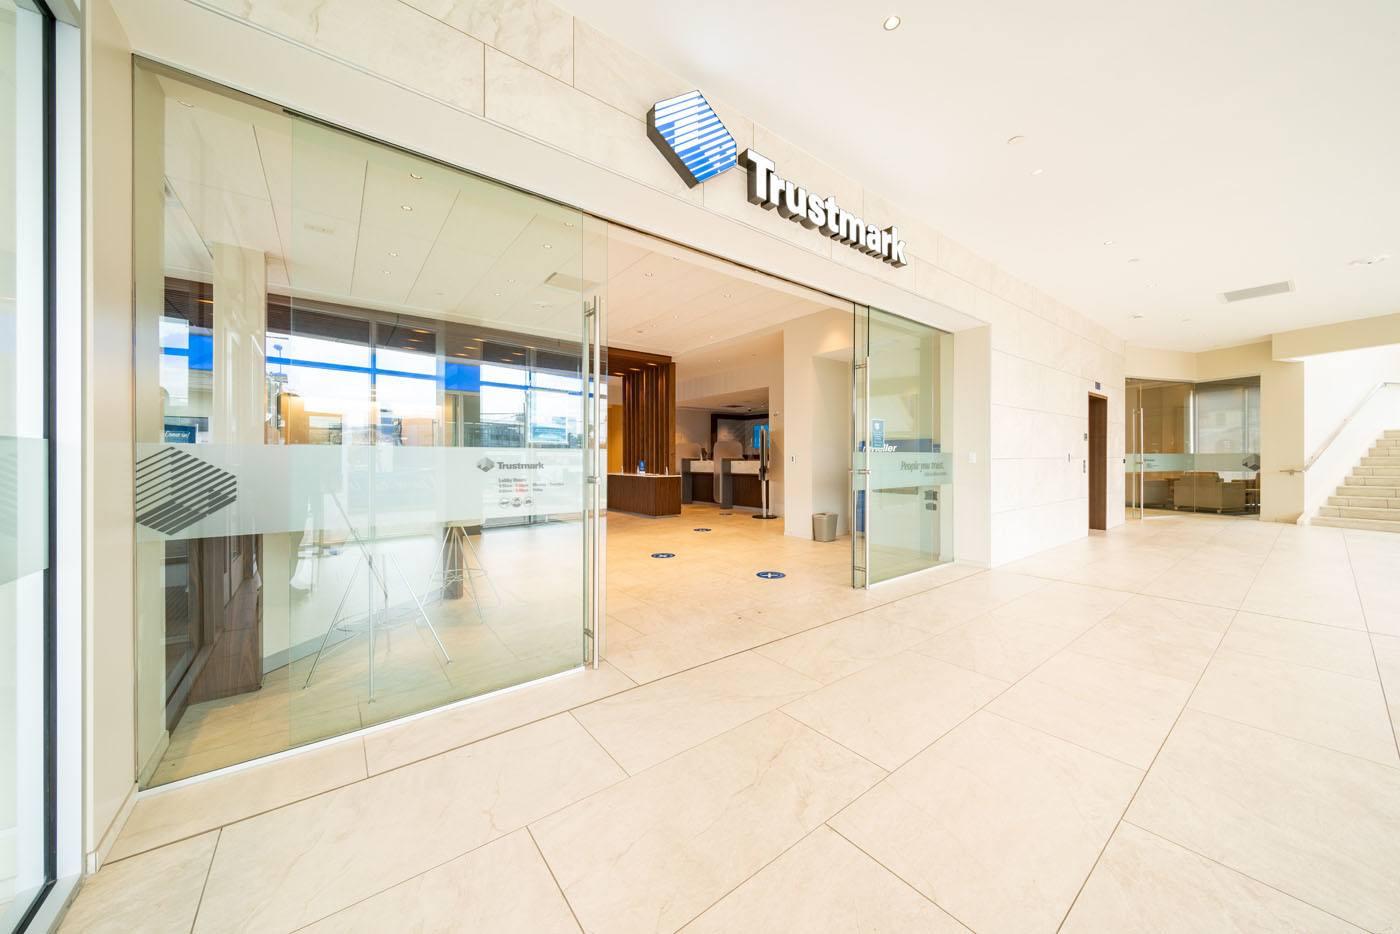 Trustmark Bank Interior